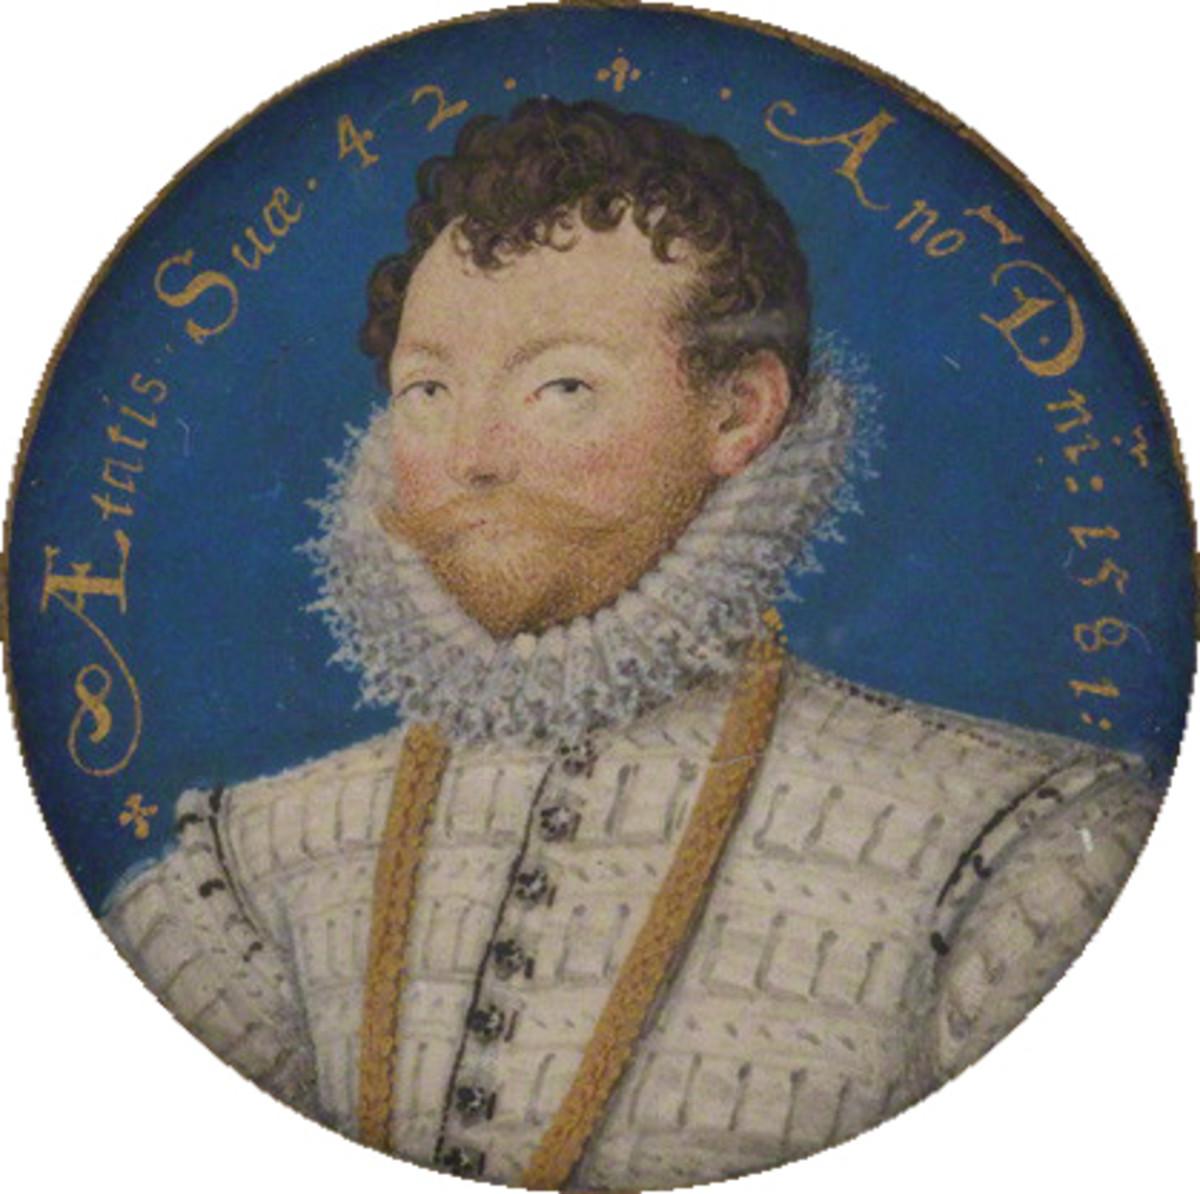 Sir Francis Drake by Nicholas Hillyard circa 1581.